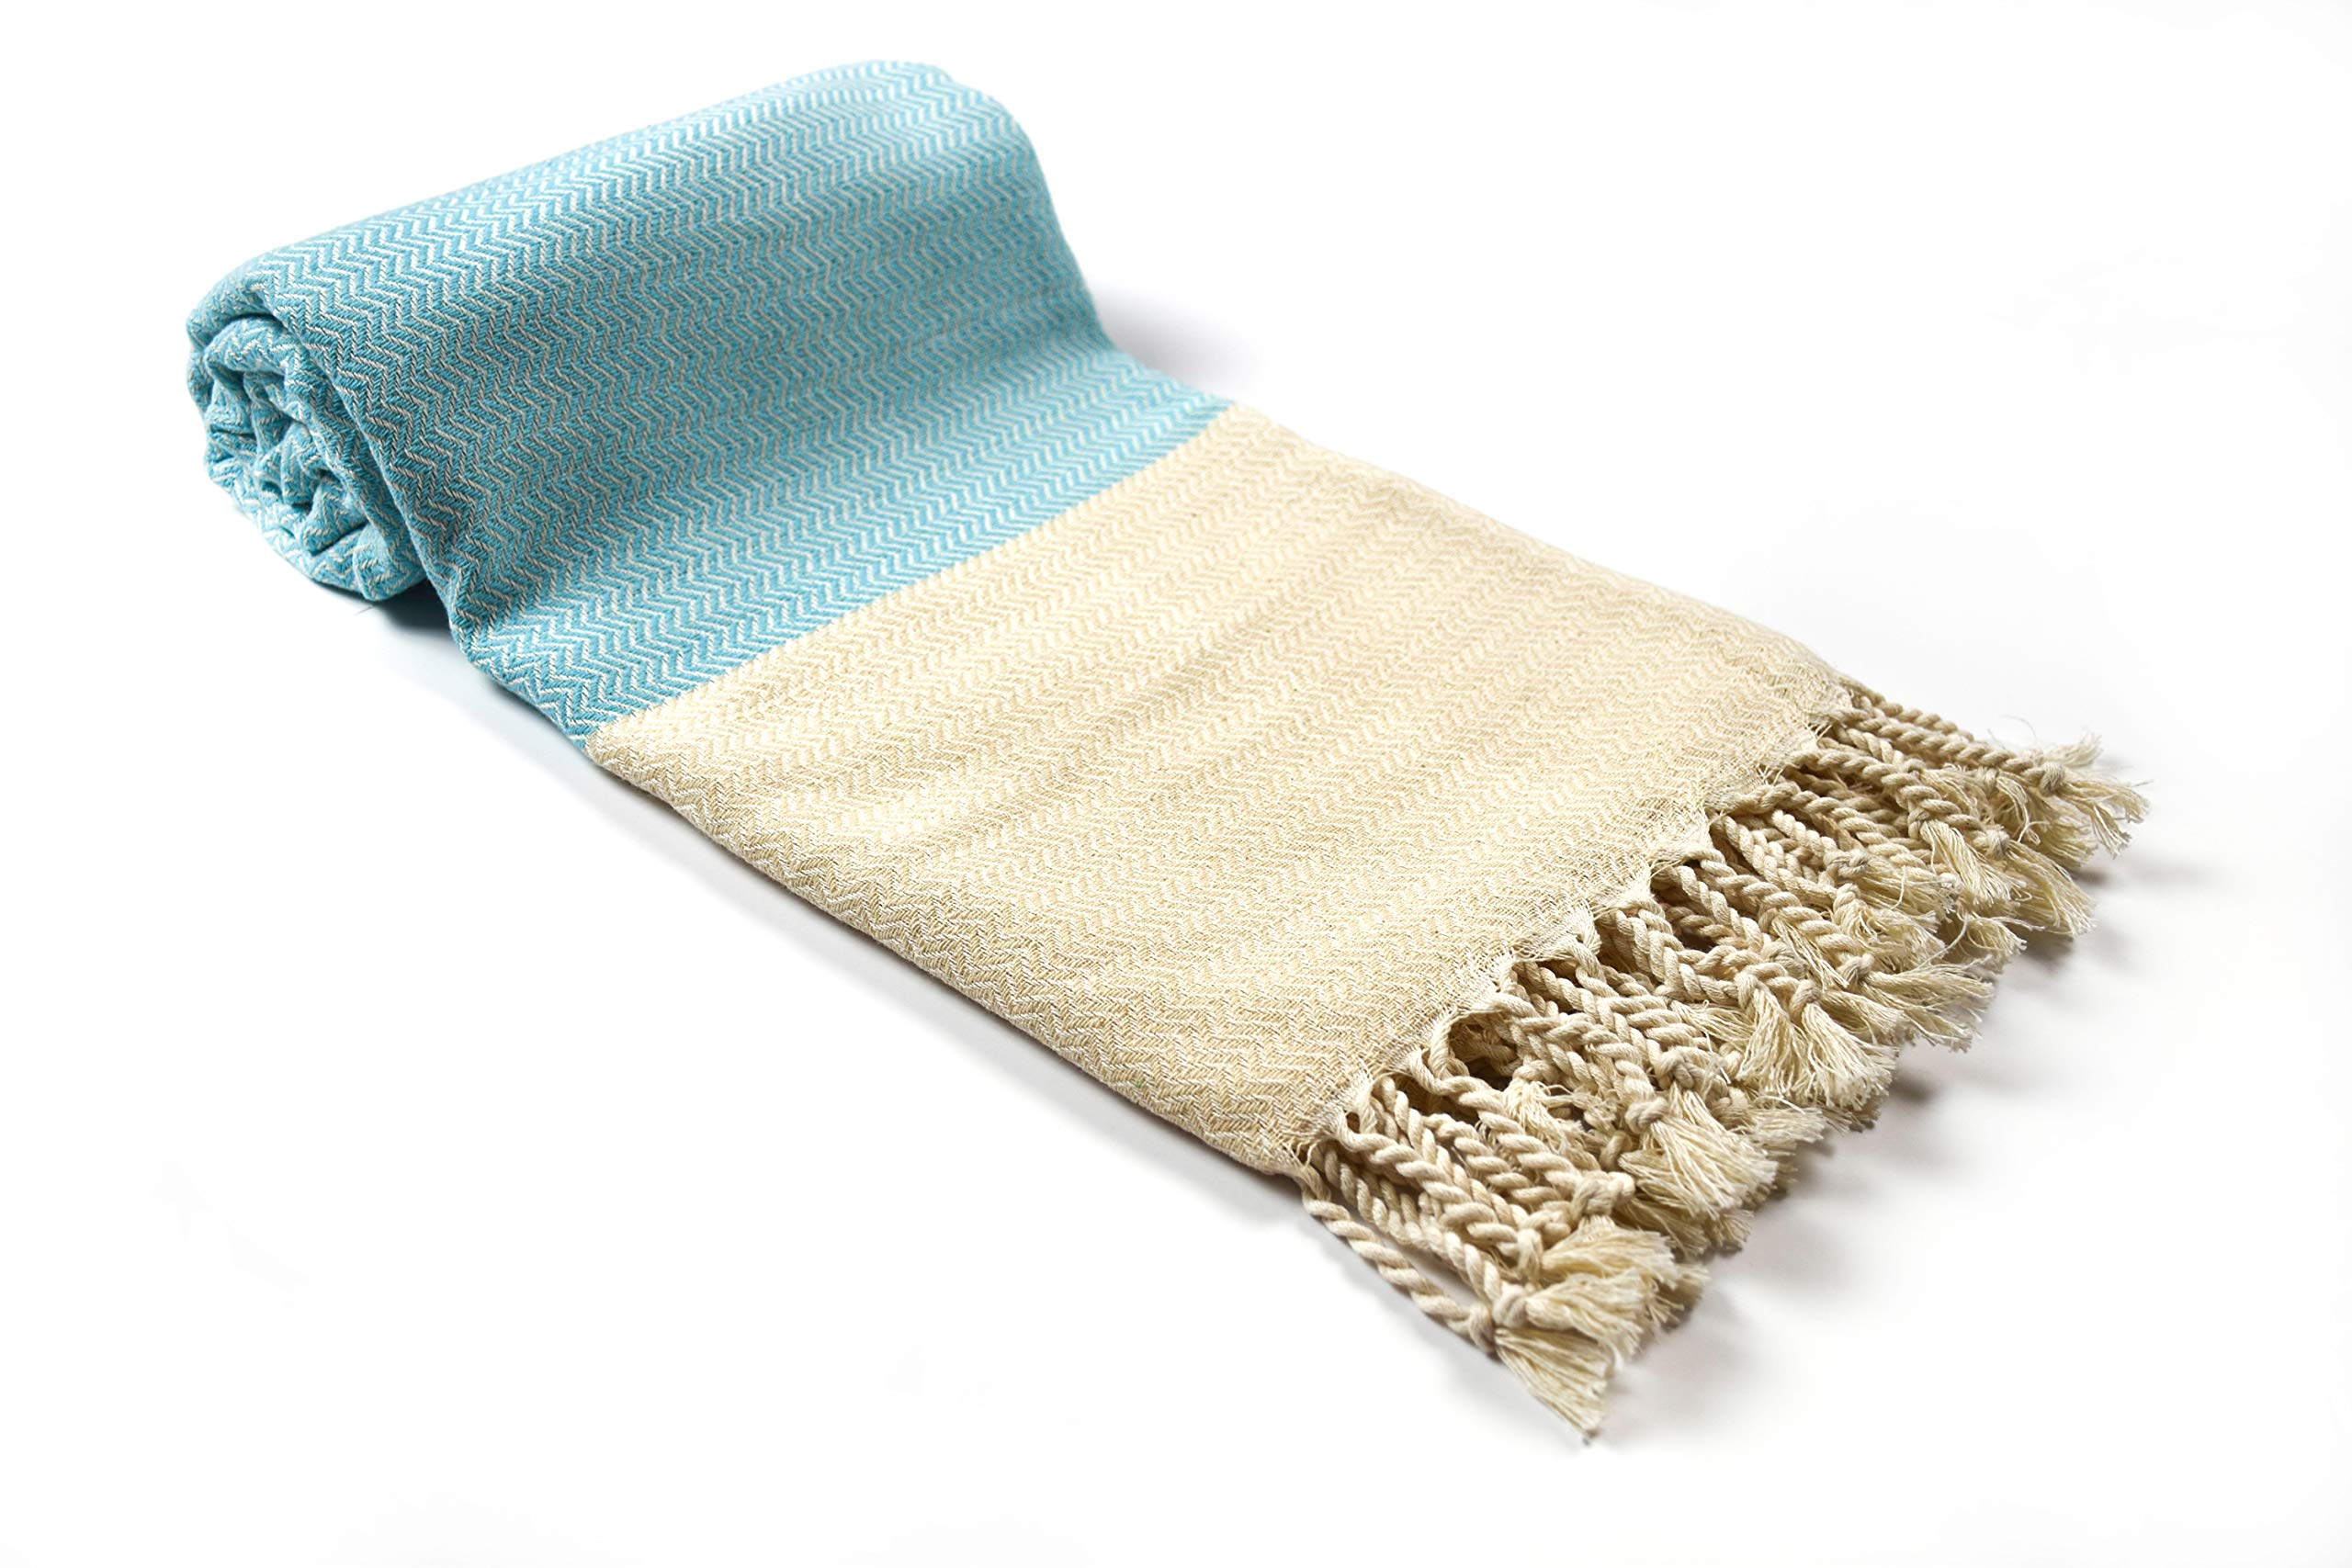 Mihra Turkish Cotton Bath Beach Spa Sauna Hammam Yoga Gym Turkish Bath Towel Peshtemal Pestemal Blanket (Turquoise)